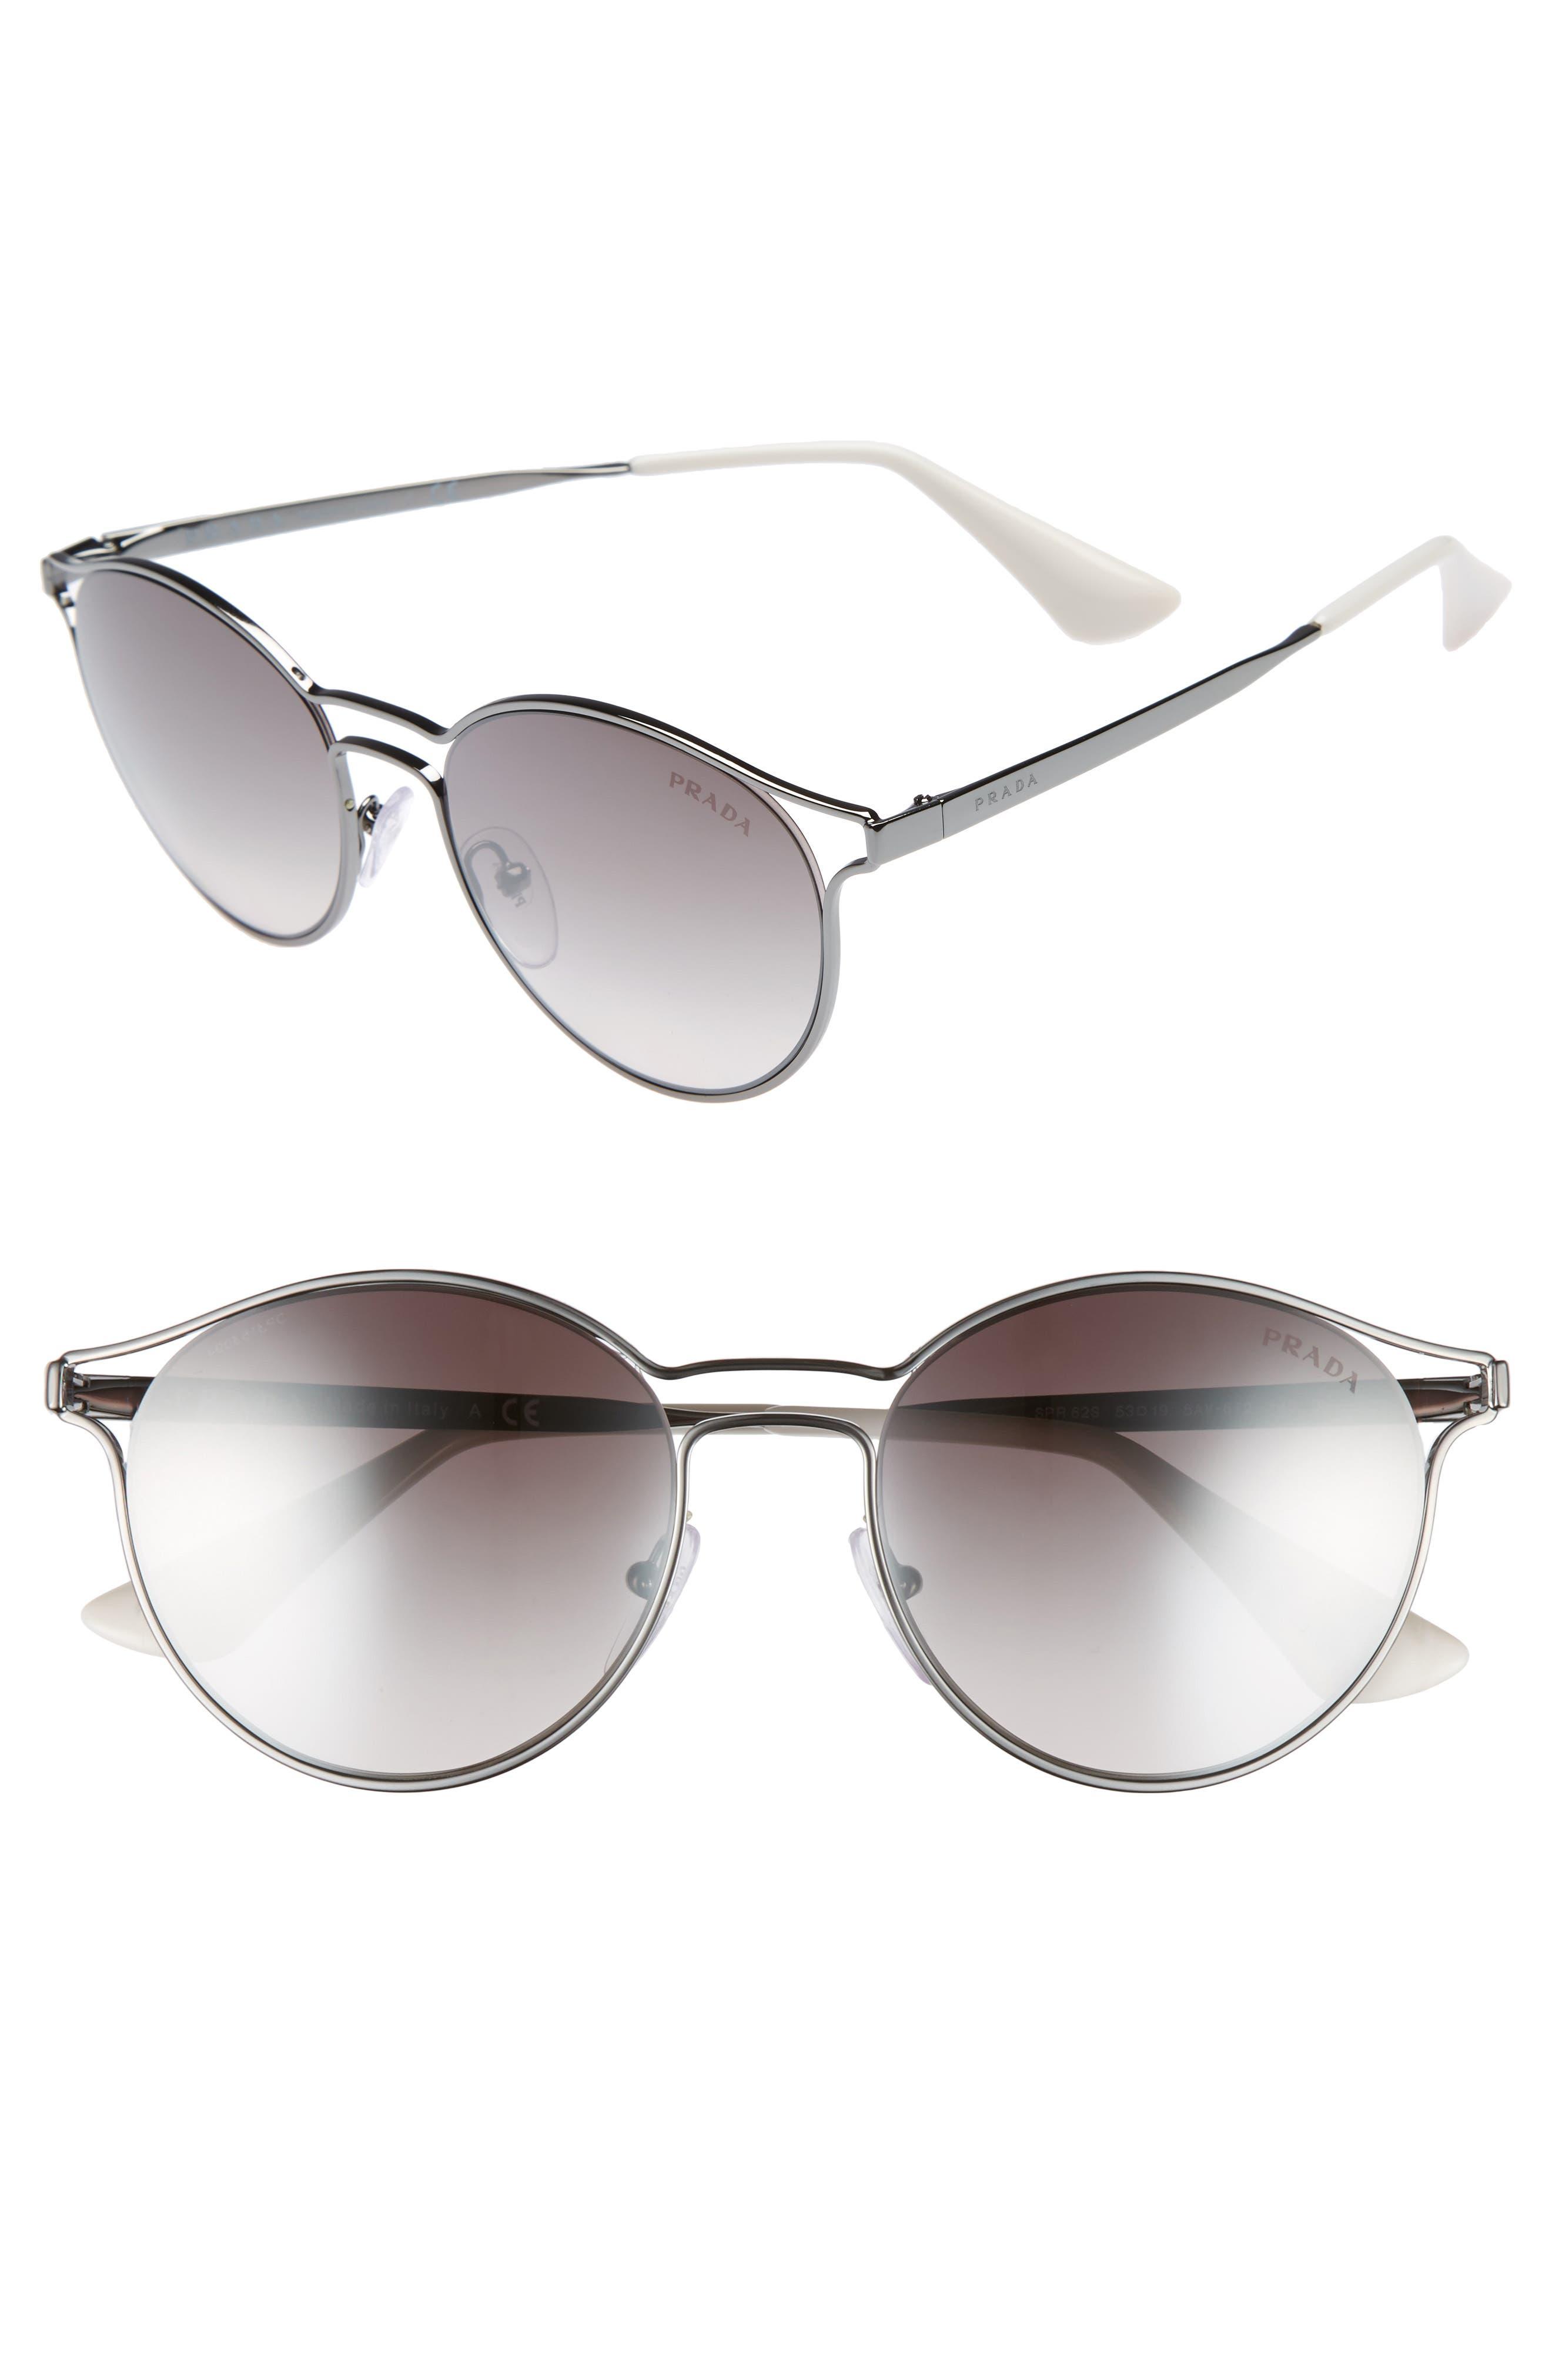 53mm Round Mirrored Sunglasses,                         Main,                         color, 062